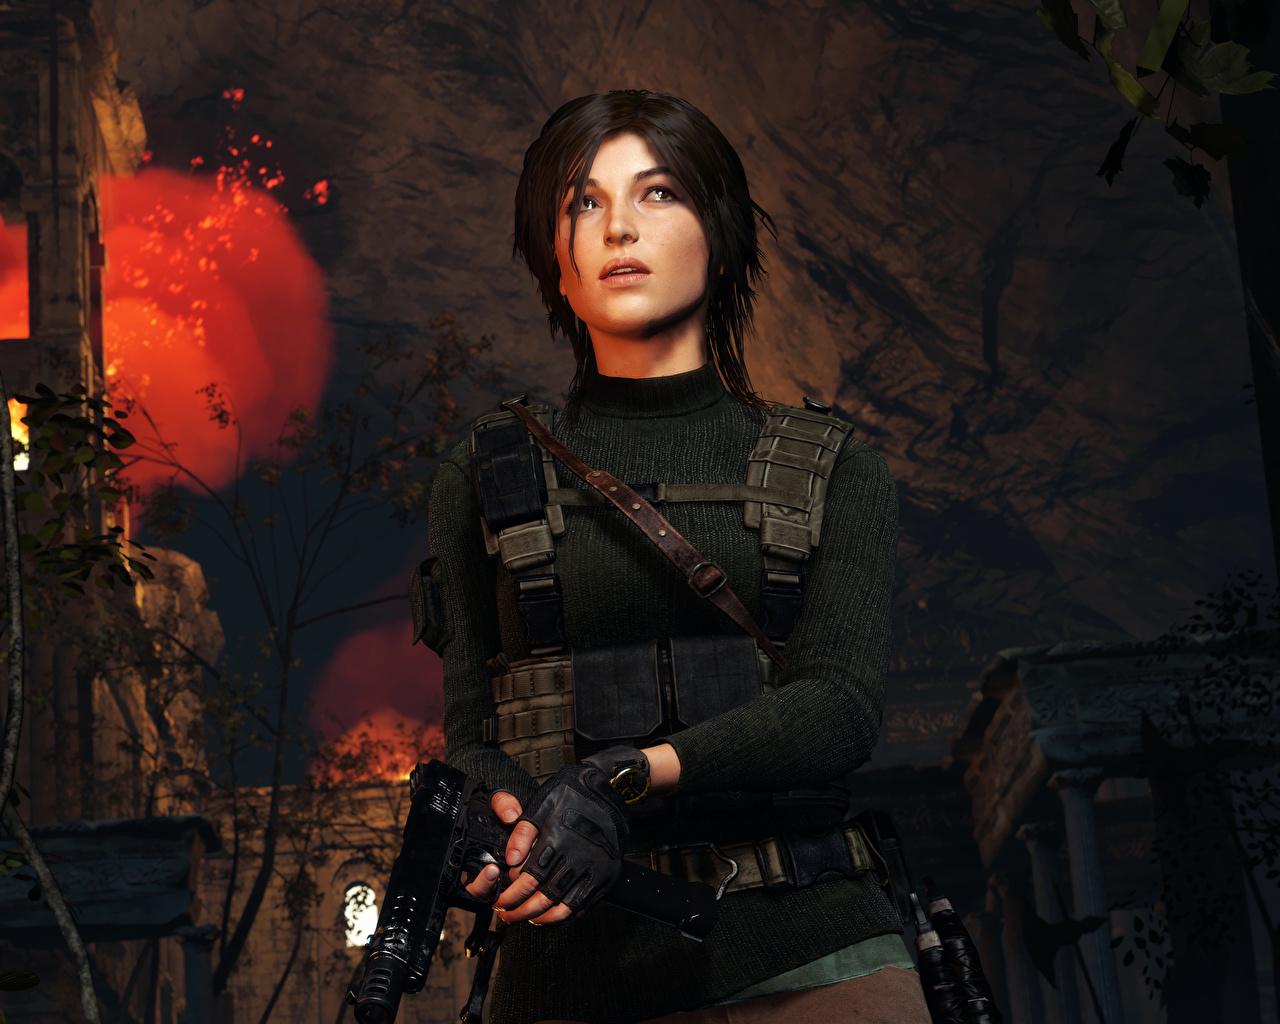 Photos Rise of the Tomb Raider pistol Lara Croft Girls 3D